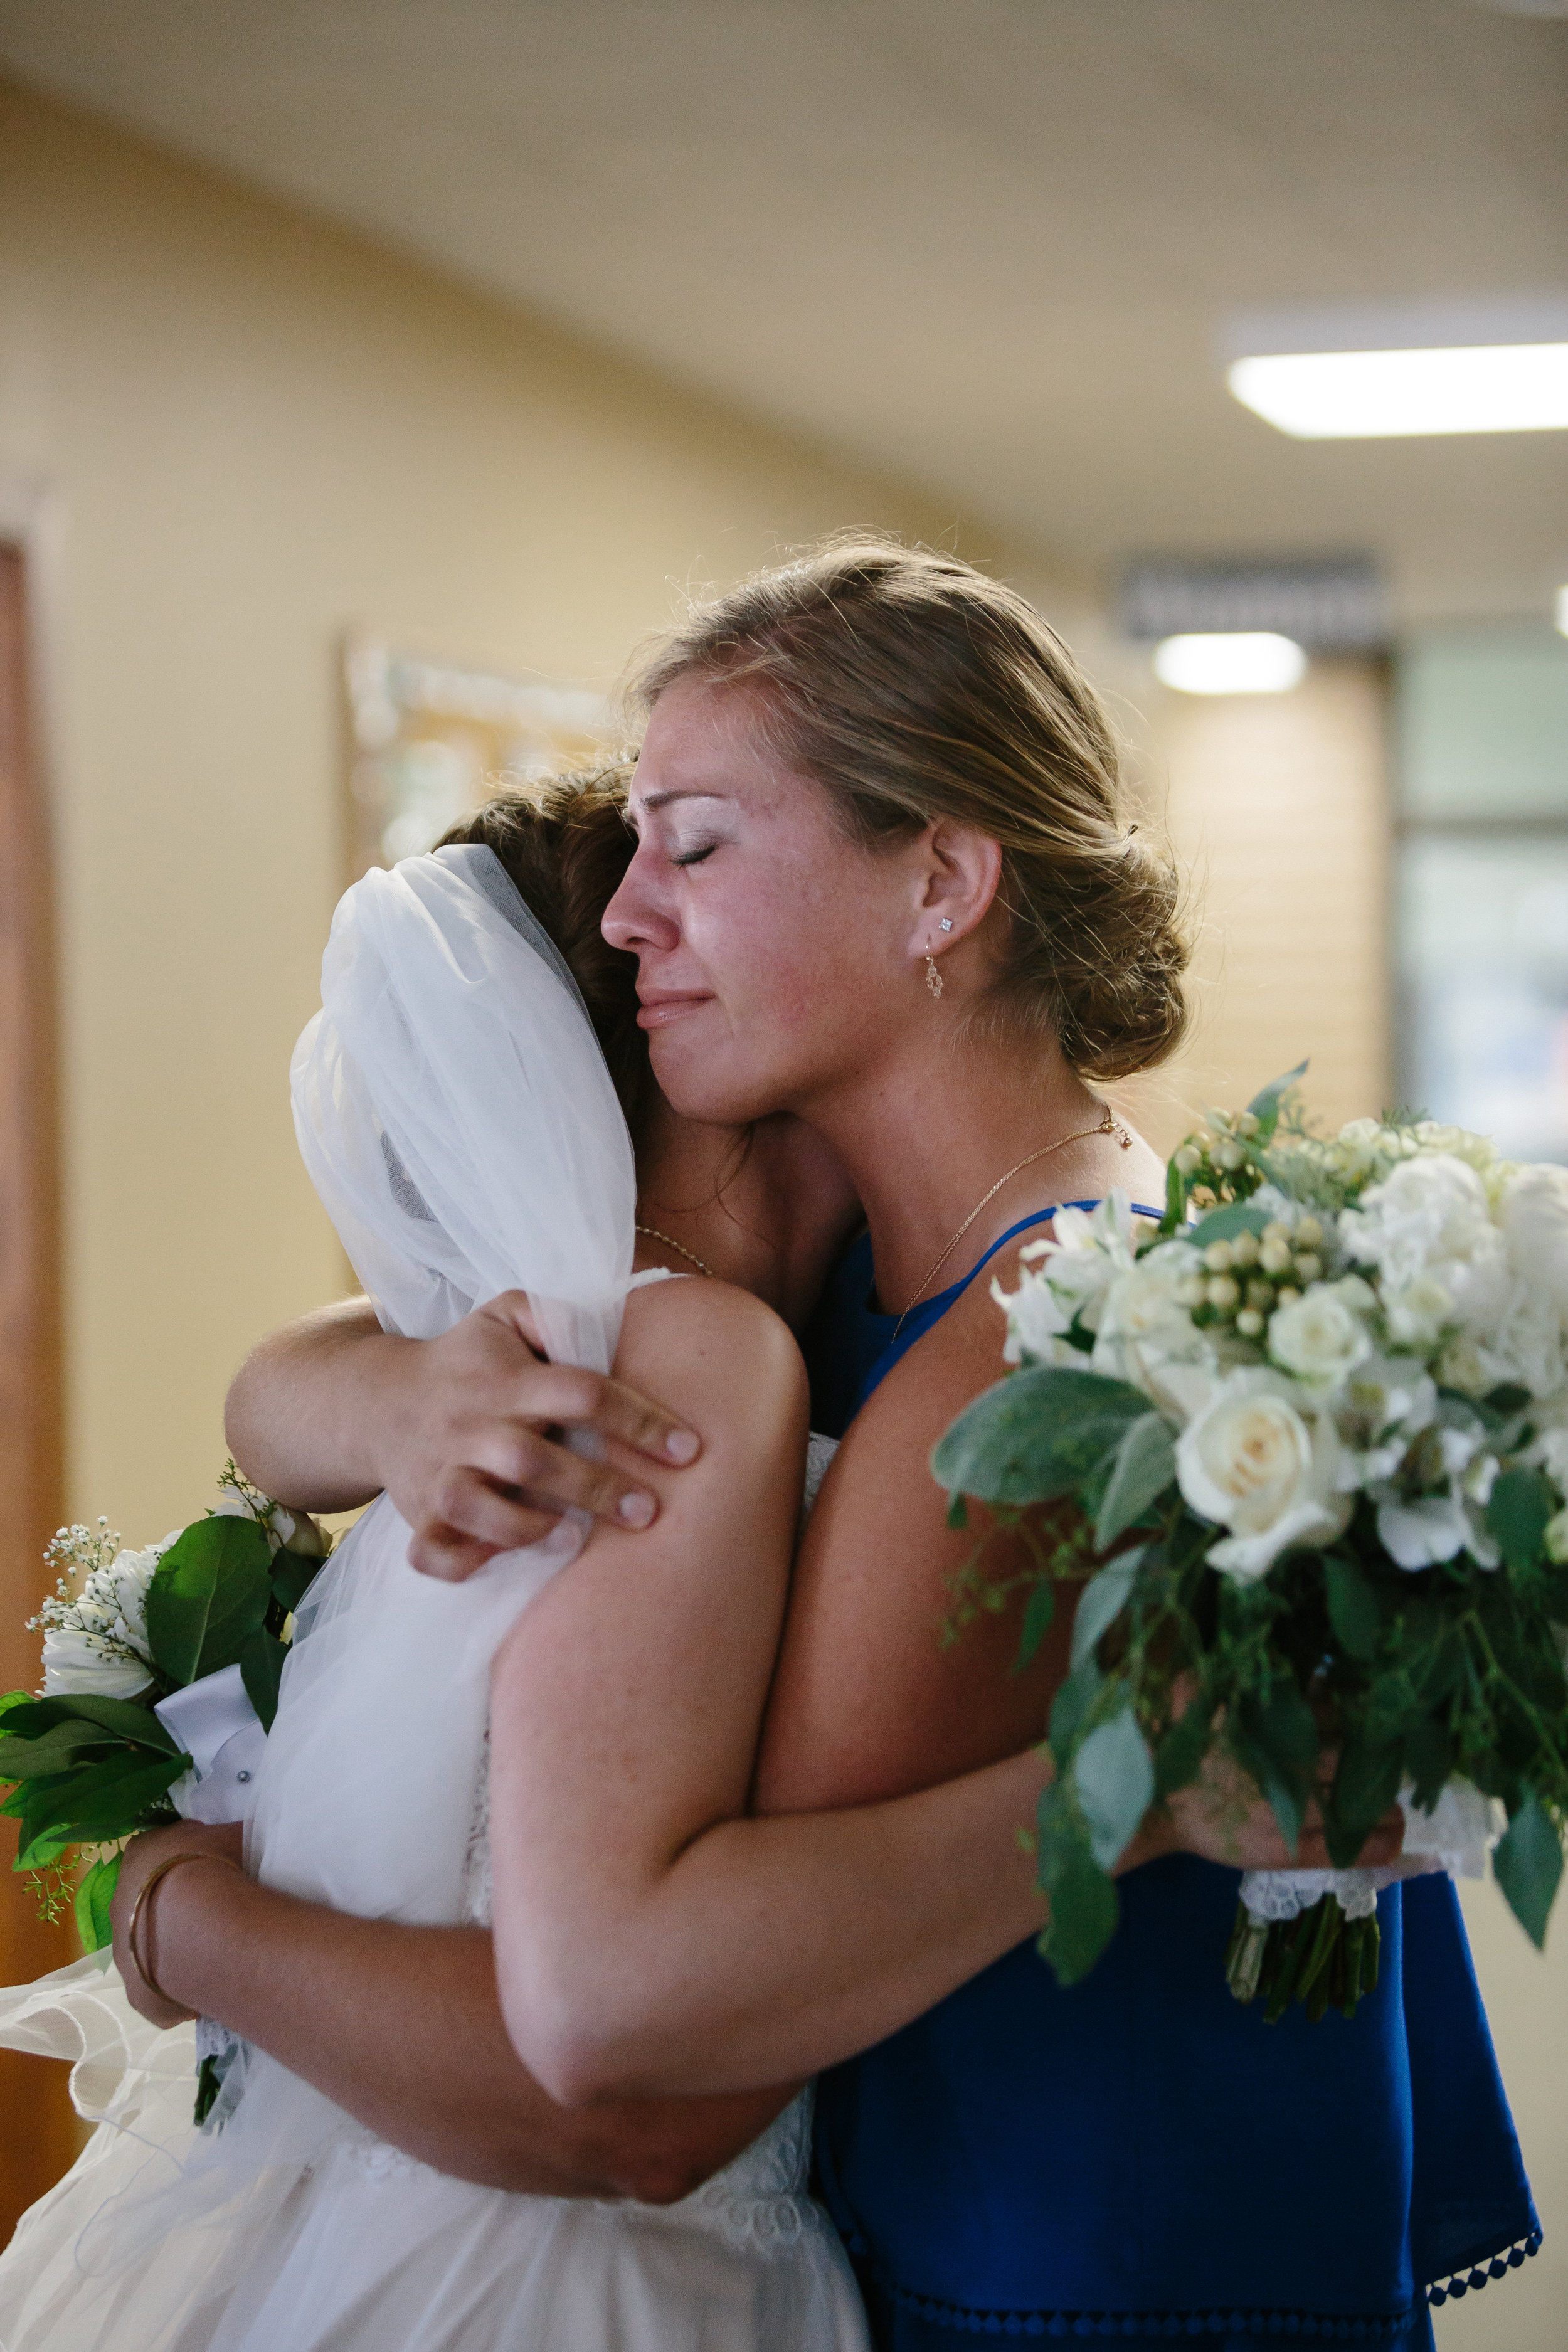 Jordan & Shantel Married - Idaho - Corrie Mick Photography-241.jpg